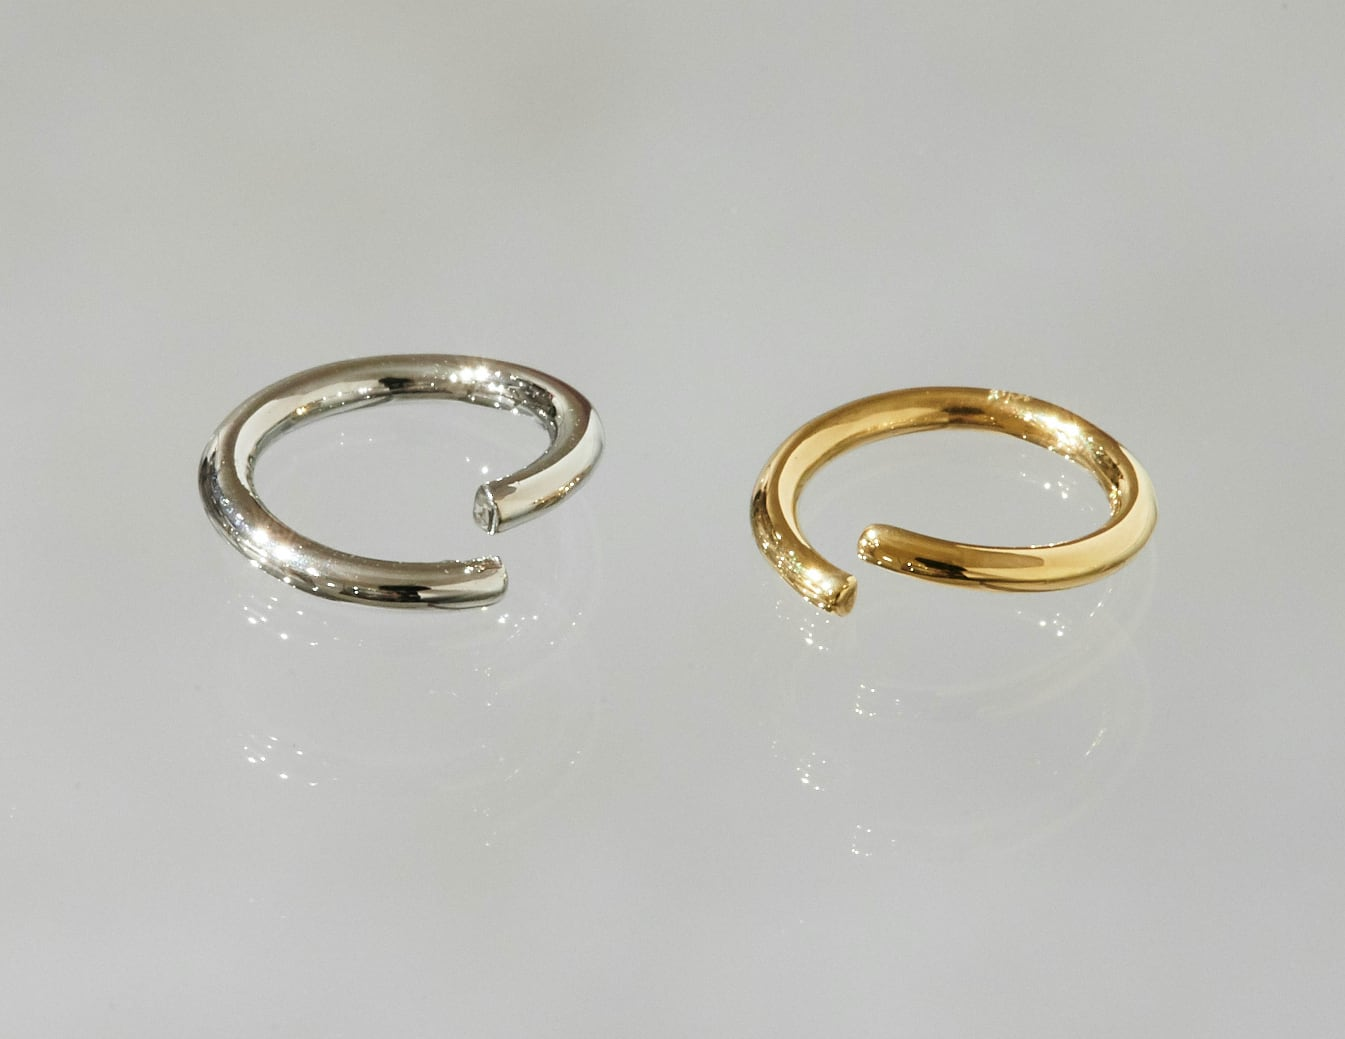 ring body jewelry 16G 9.2mm  /K18 Yellow Gold, K18 Pink Gold, Pt #LJ18046P